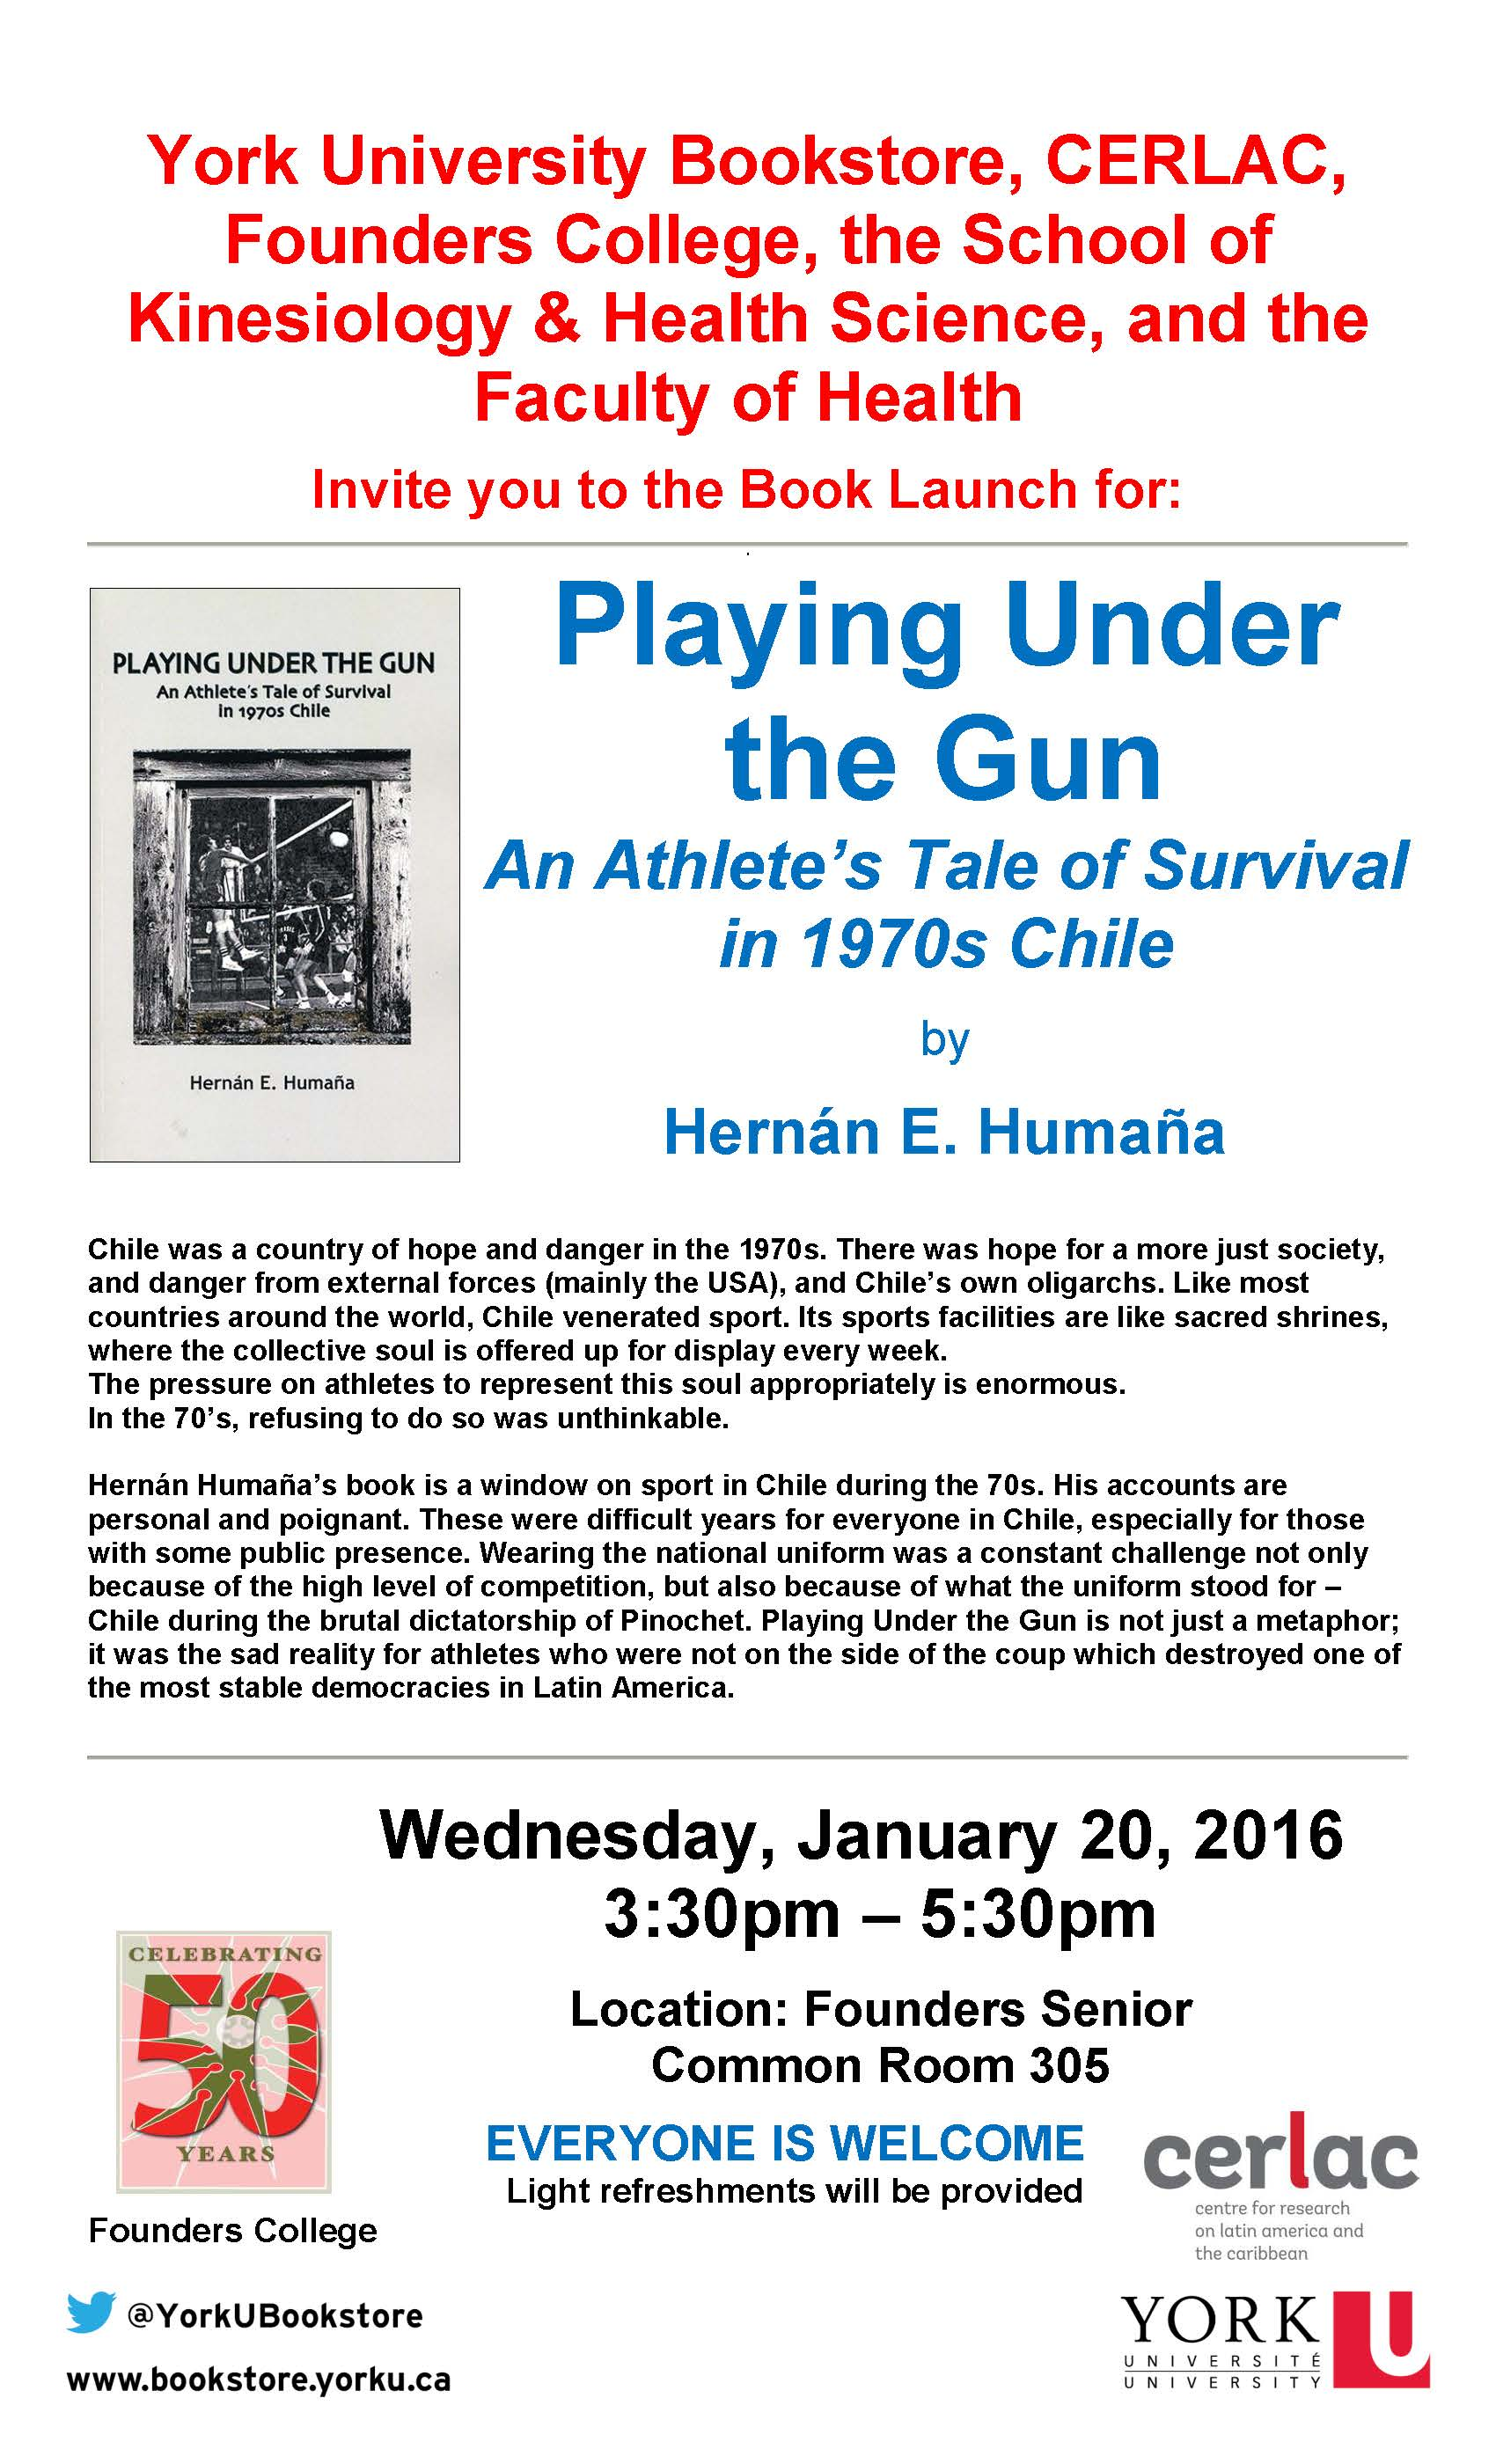 Hernan Humana Book Launch Poster